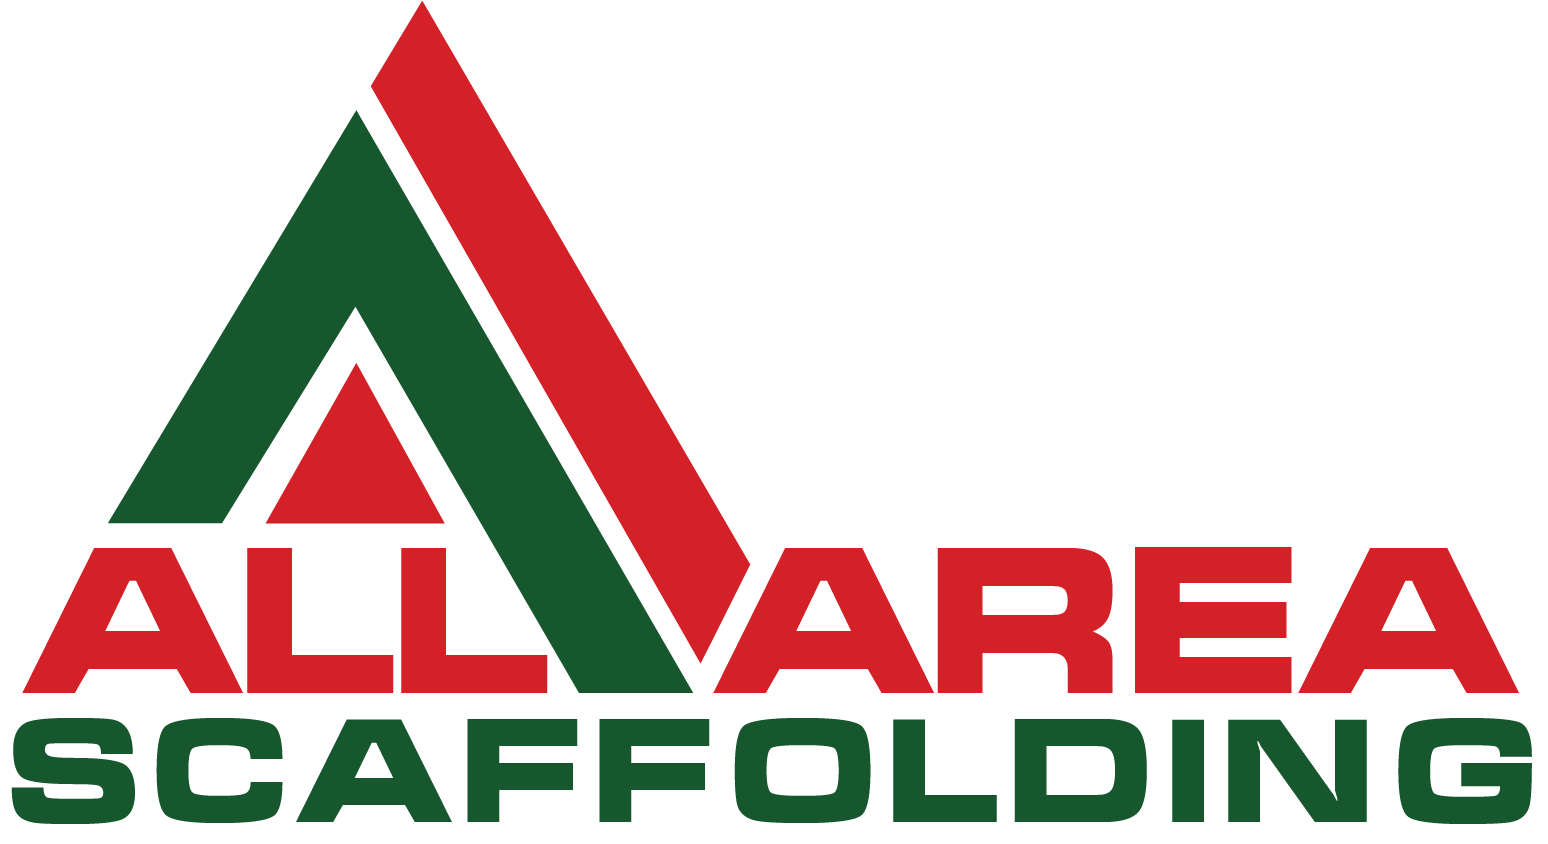 All Area Scaffolding